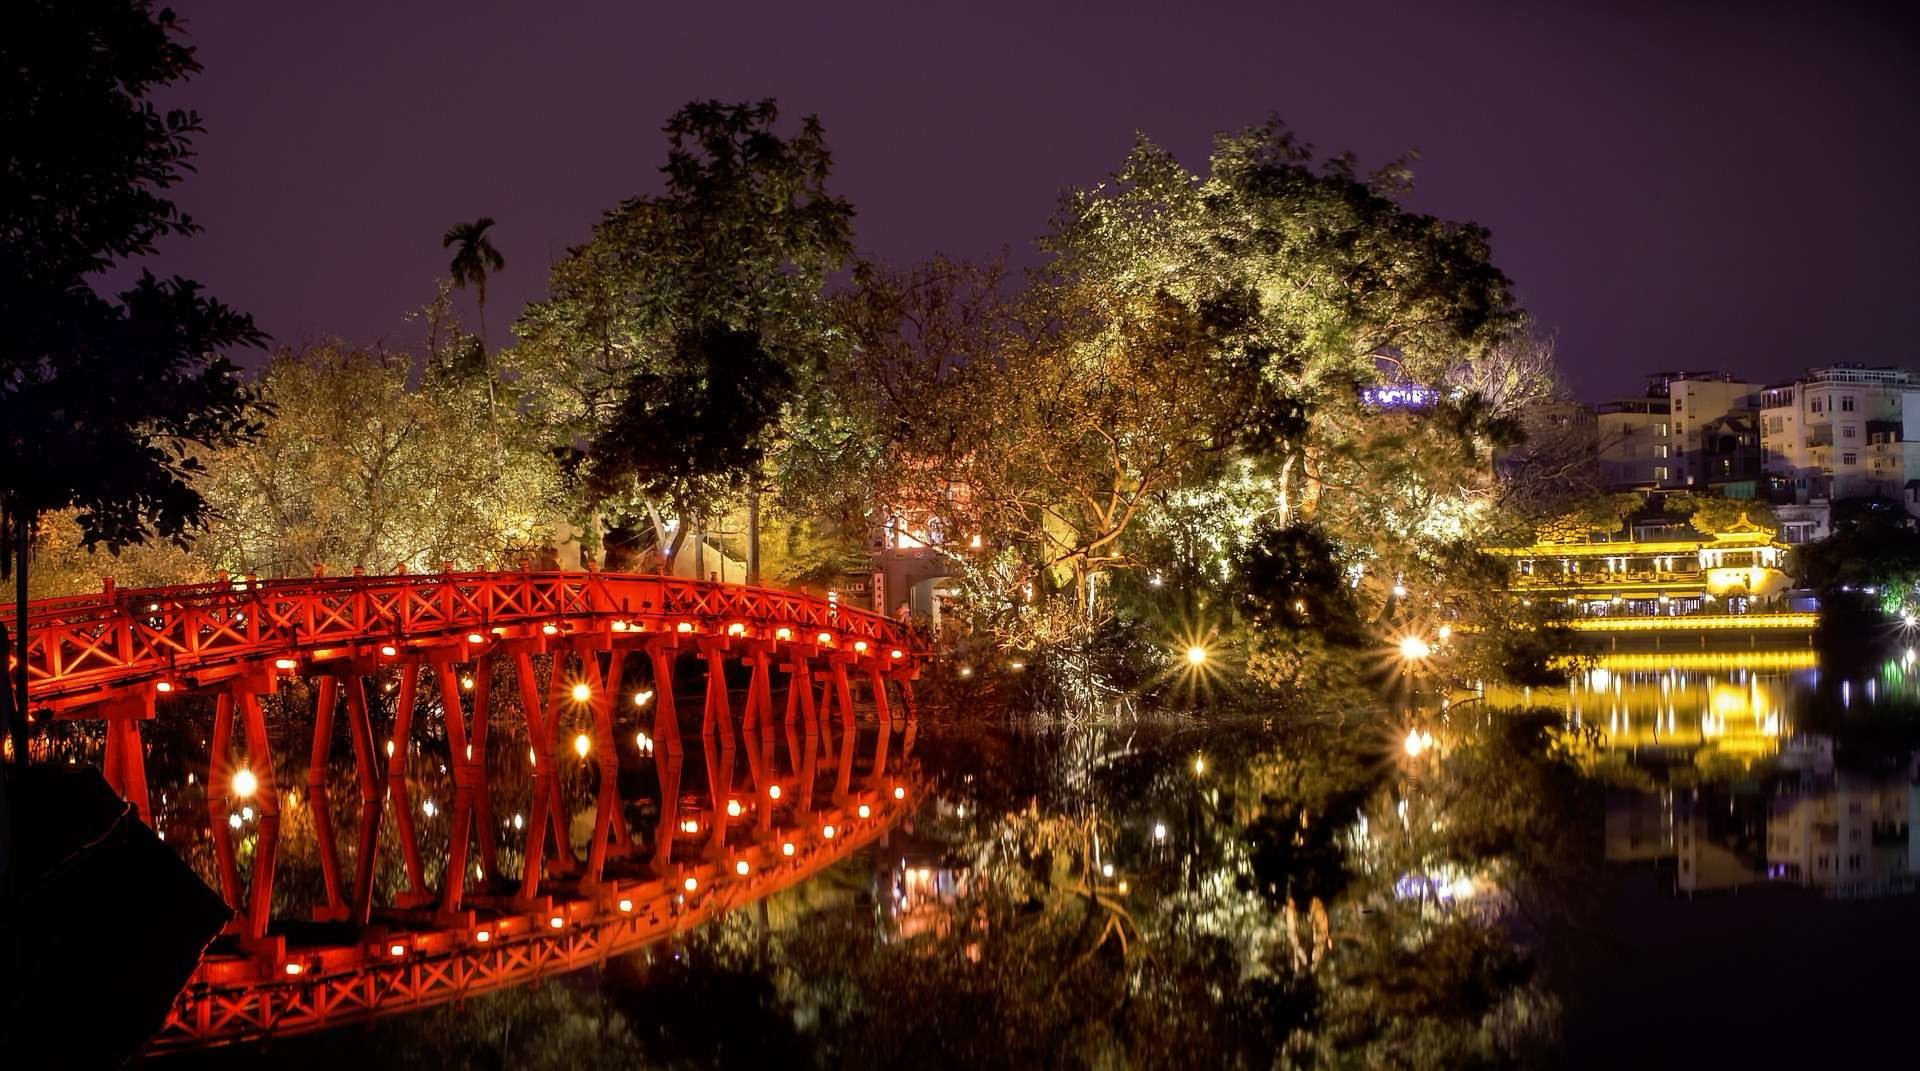 16-Day Discover Vietnam & Cambodia - Vietnam and Cambodia Itinerary